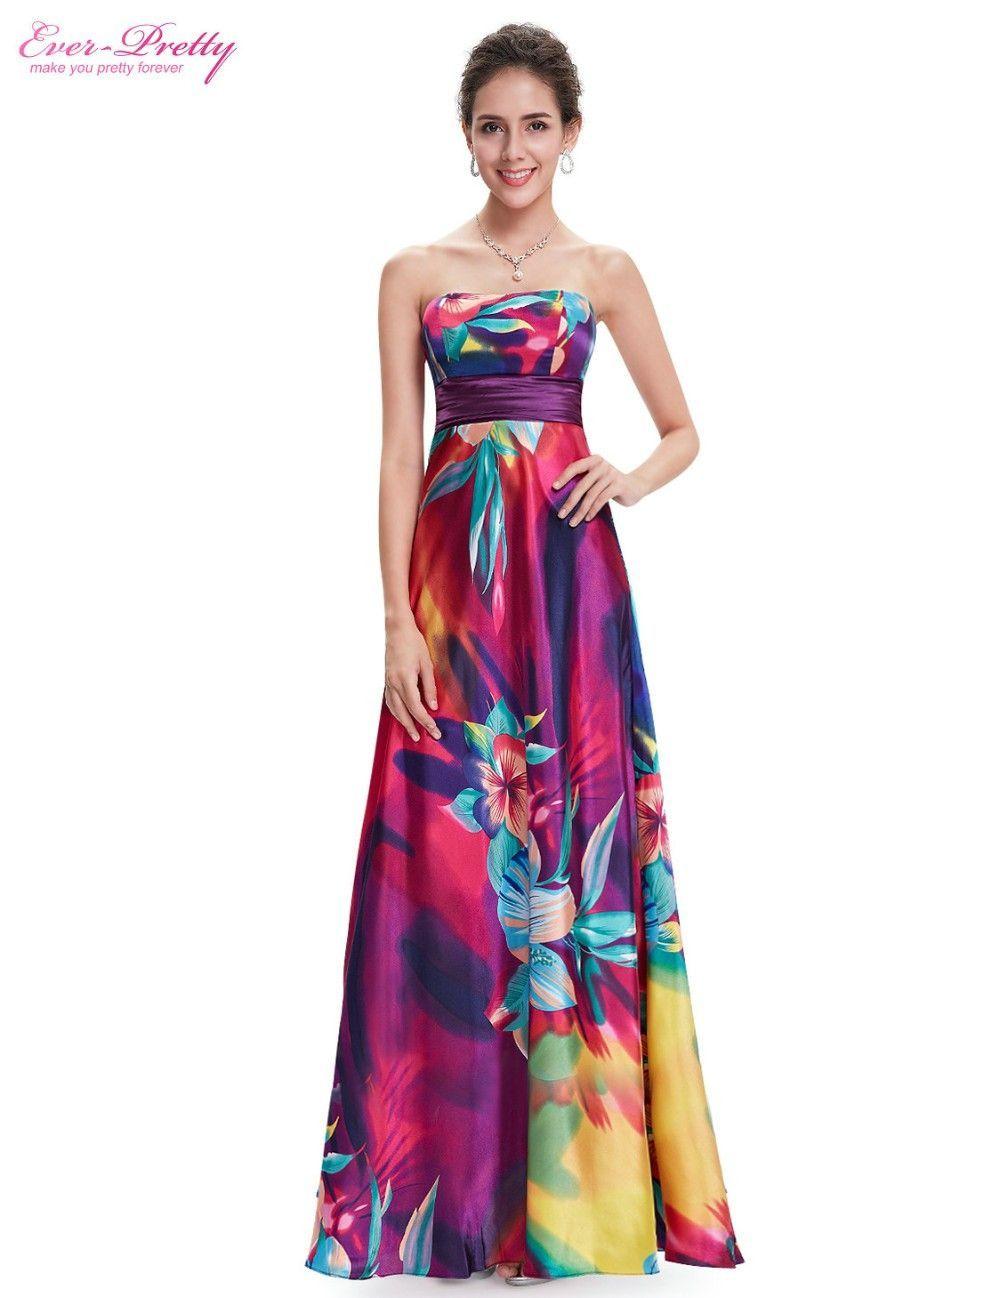 Occasion Formal Evening Item Type Evening Dresses Waistline Empire Is Customized No Fabri Floral Evening Dresses Maxi Dress Evening Strapless Evening Dress [ 1298 x 1000 Pixel ]